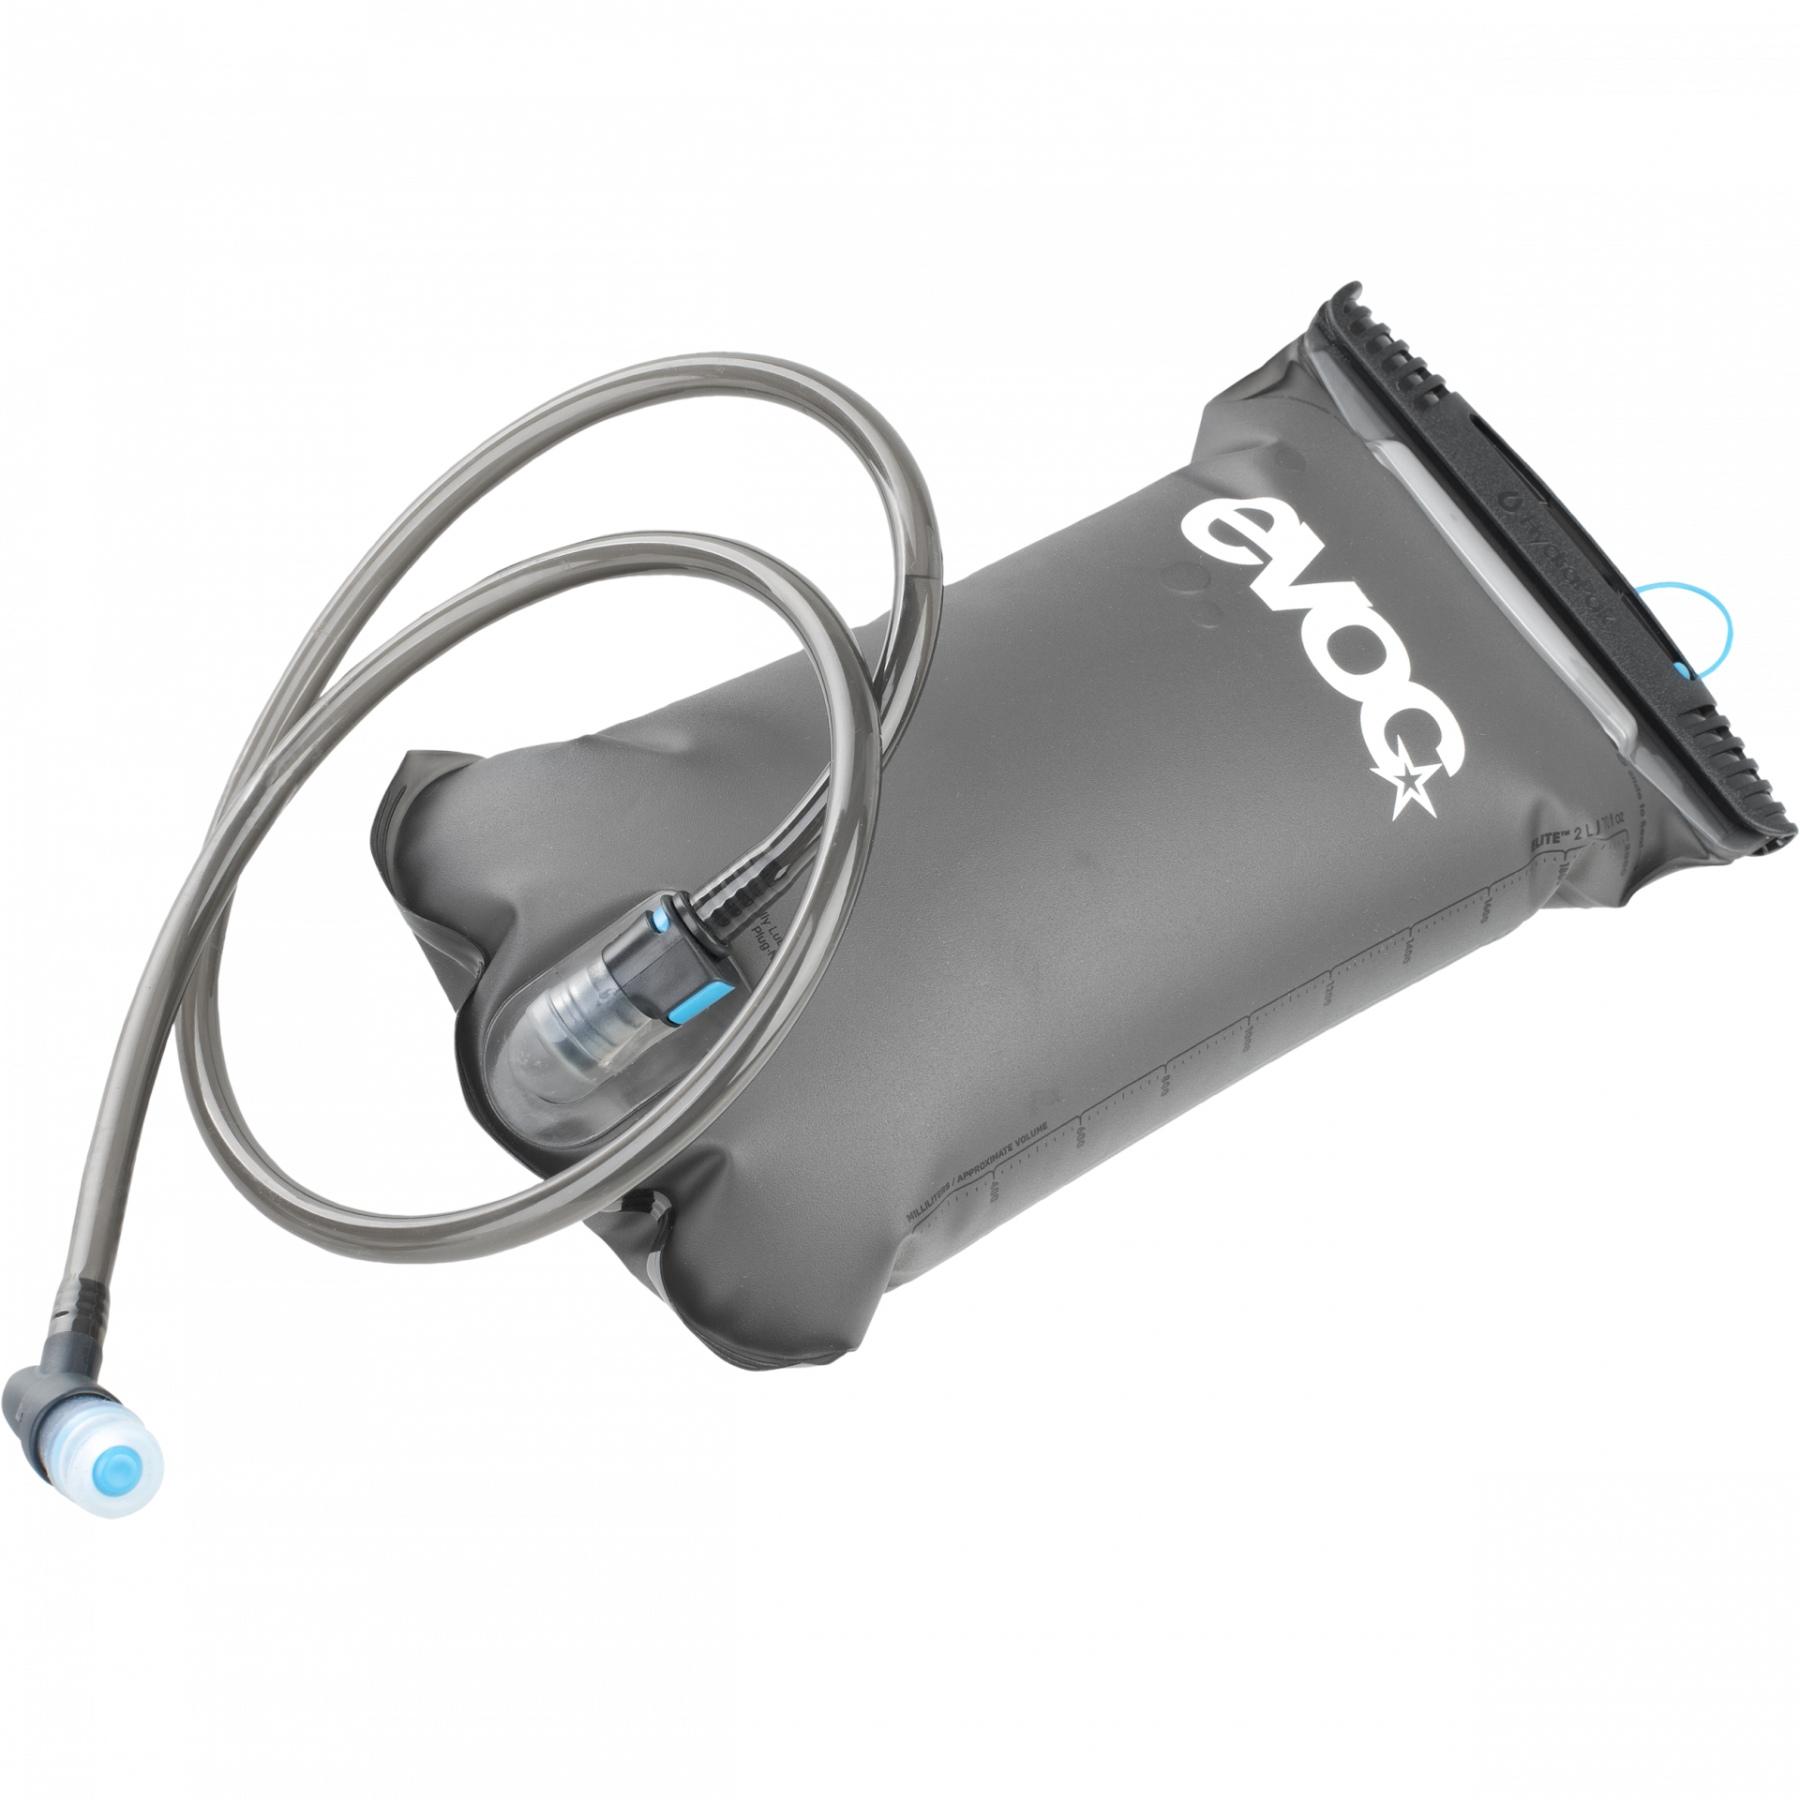 Picture of Evoc Hydration Bladder 2L - Carbon Grey